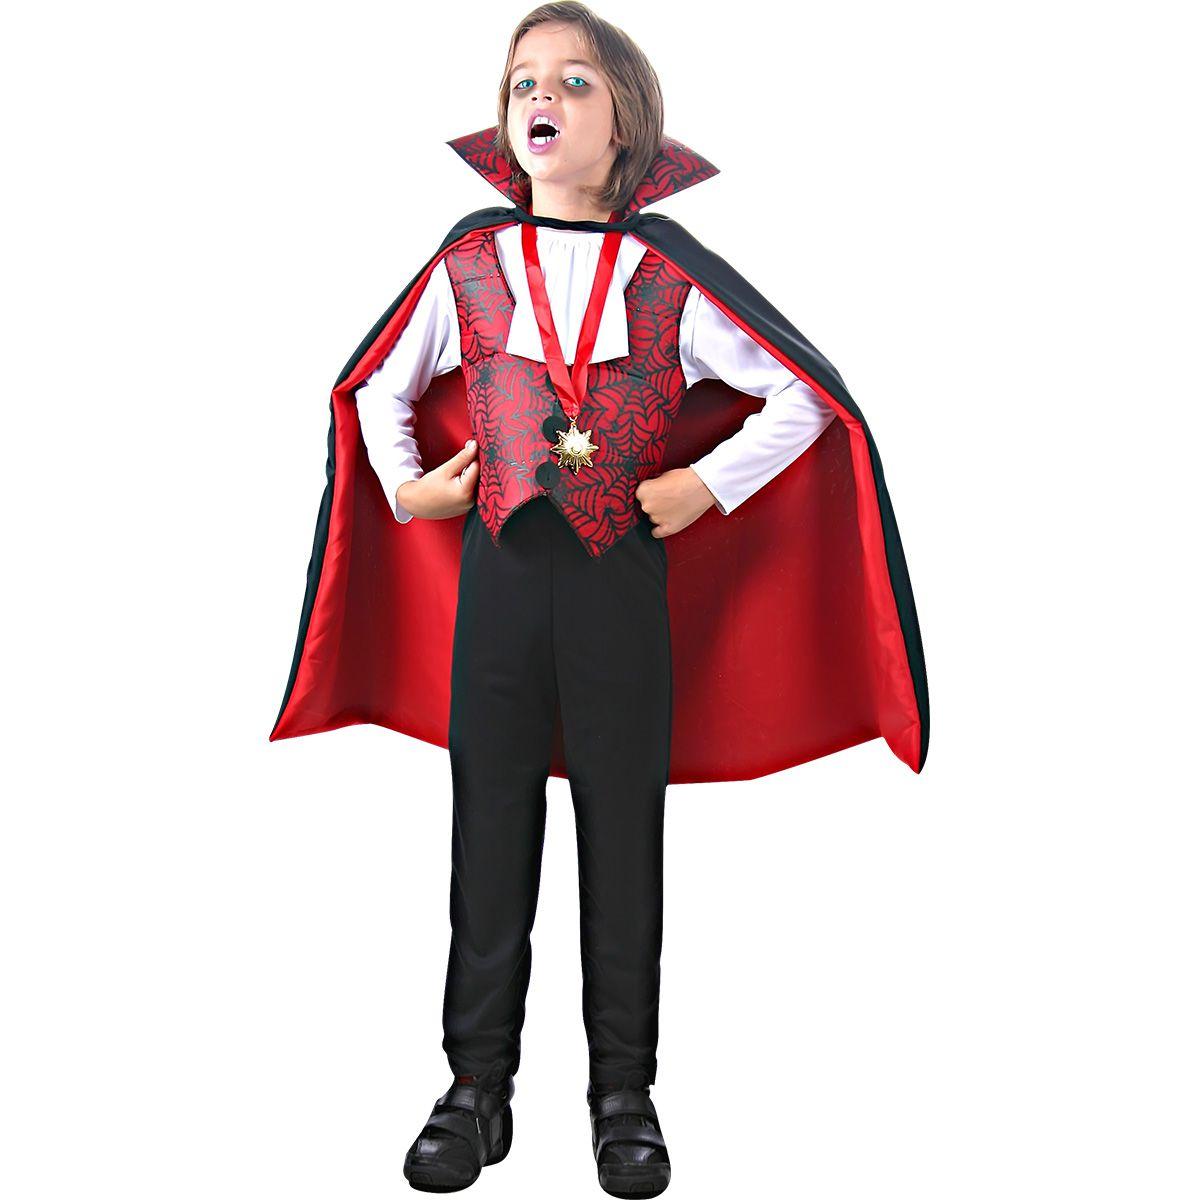 Fantasia Conde Drácula com Medalha